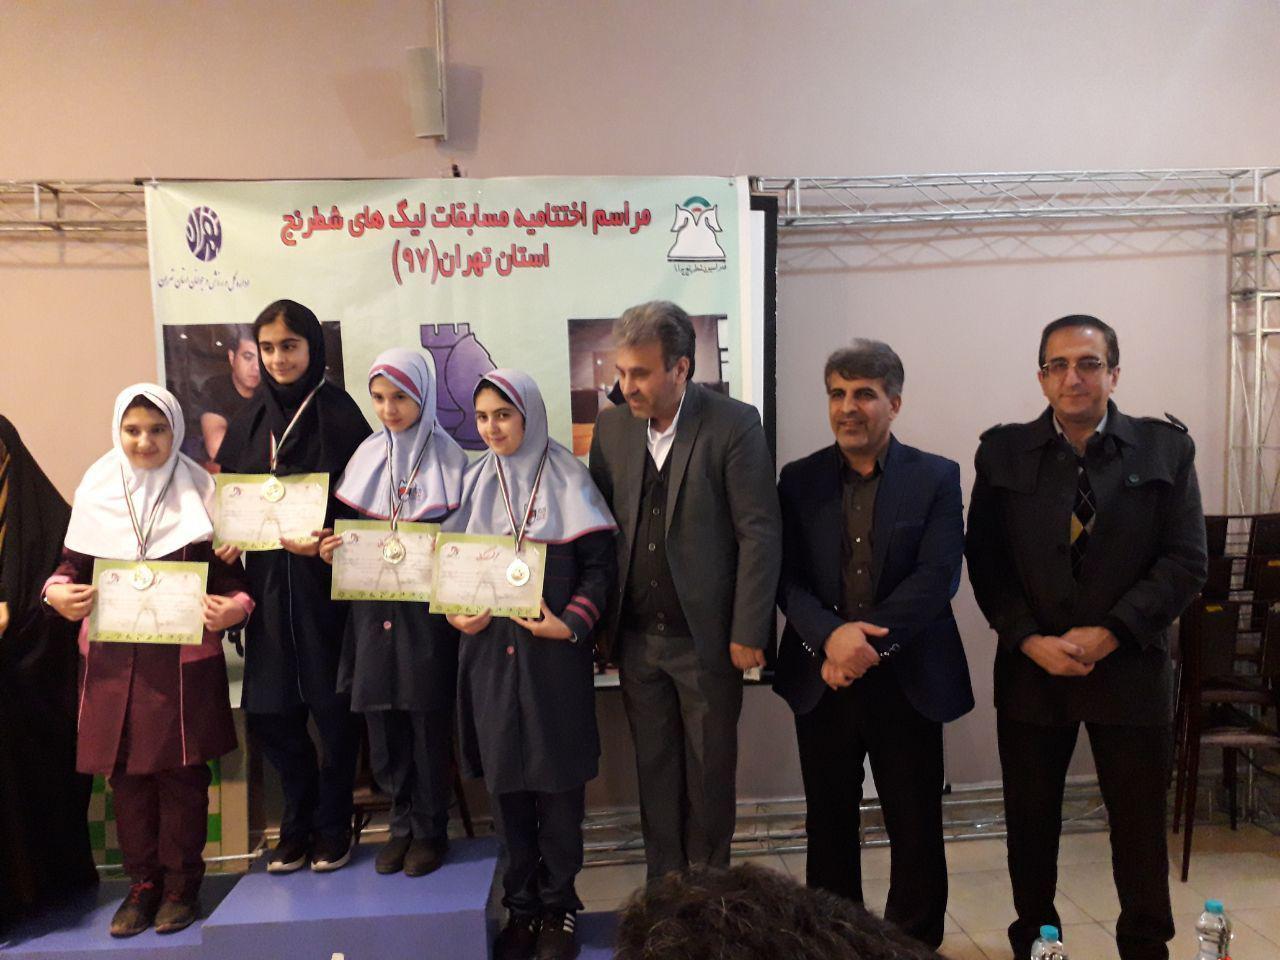 مسابقات آموزش و پرورذش استان تهران